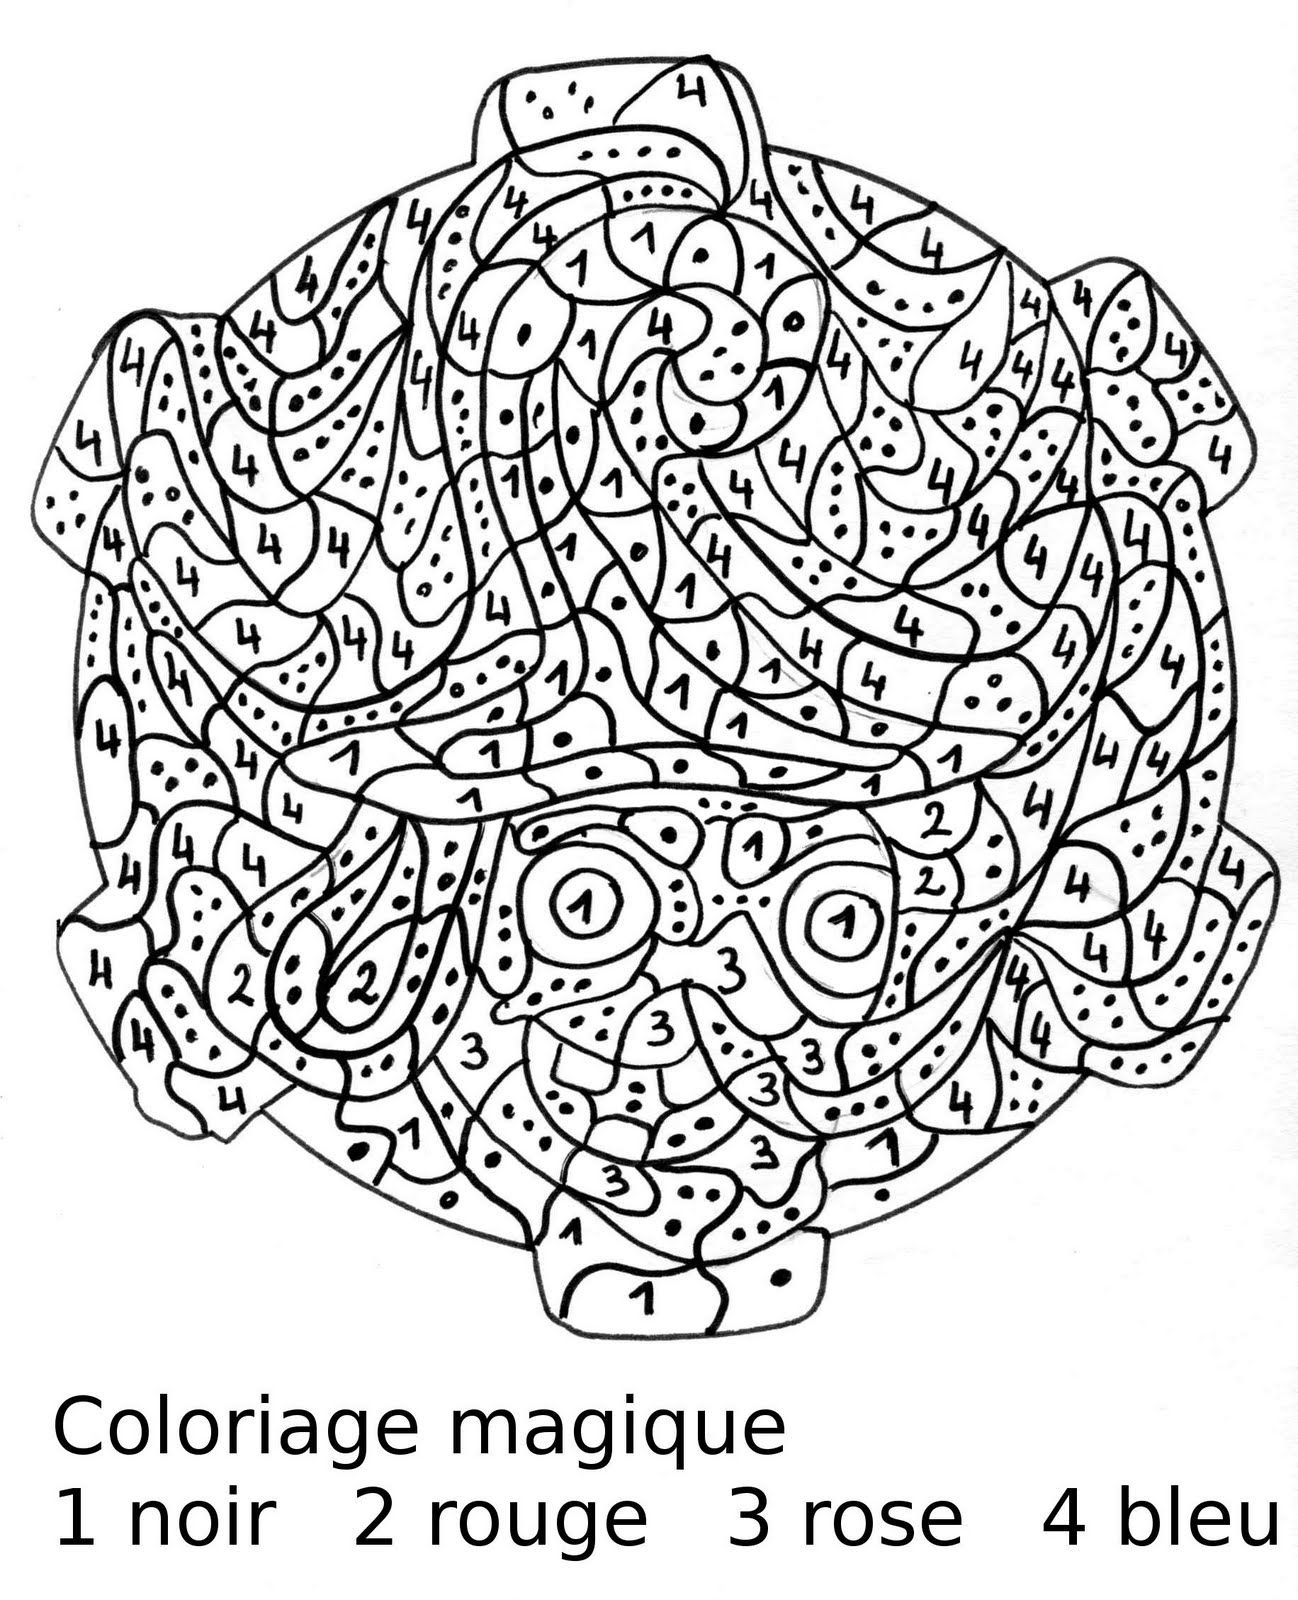 Coloriage Magique Halloween Imprimer | Goshowmeenergy avec Coloriage Magique A Imprimer